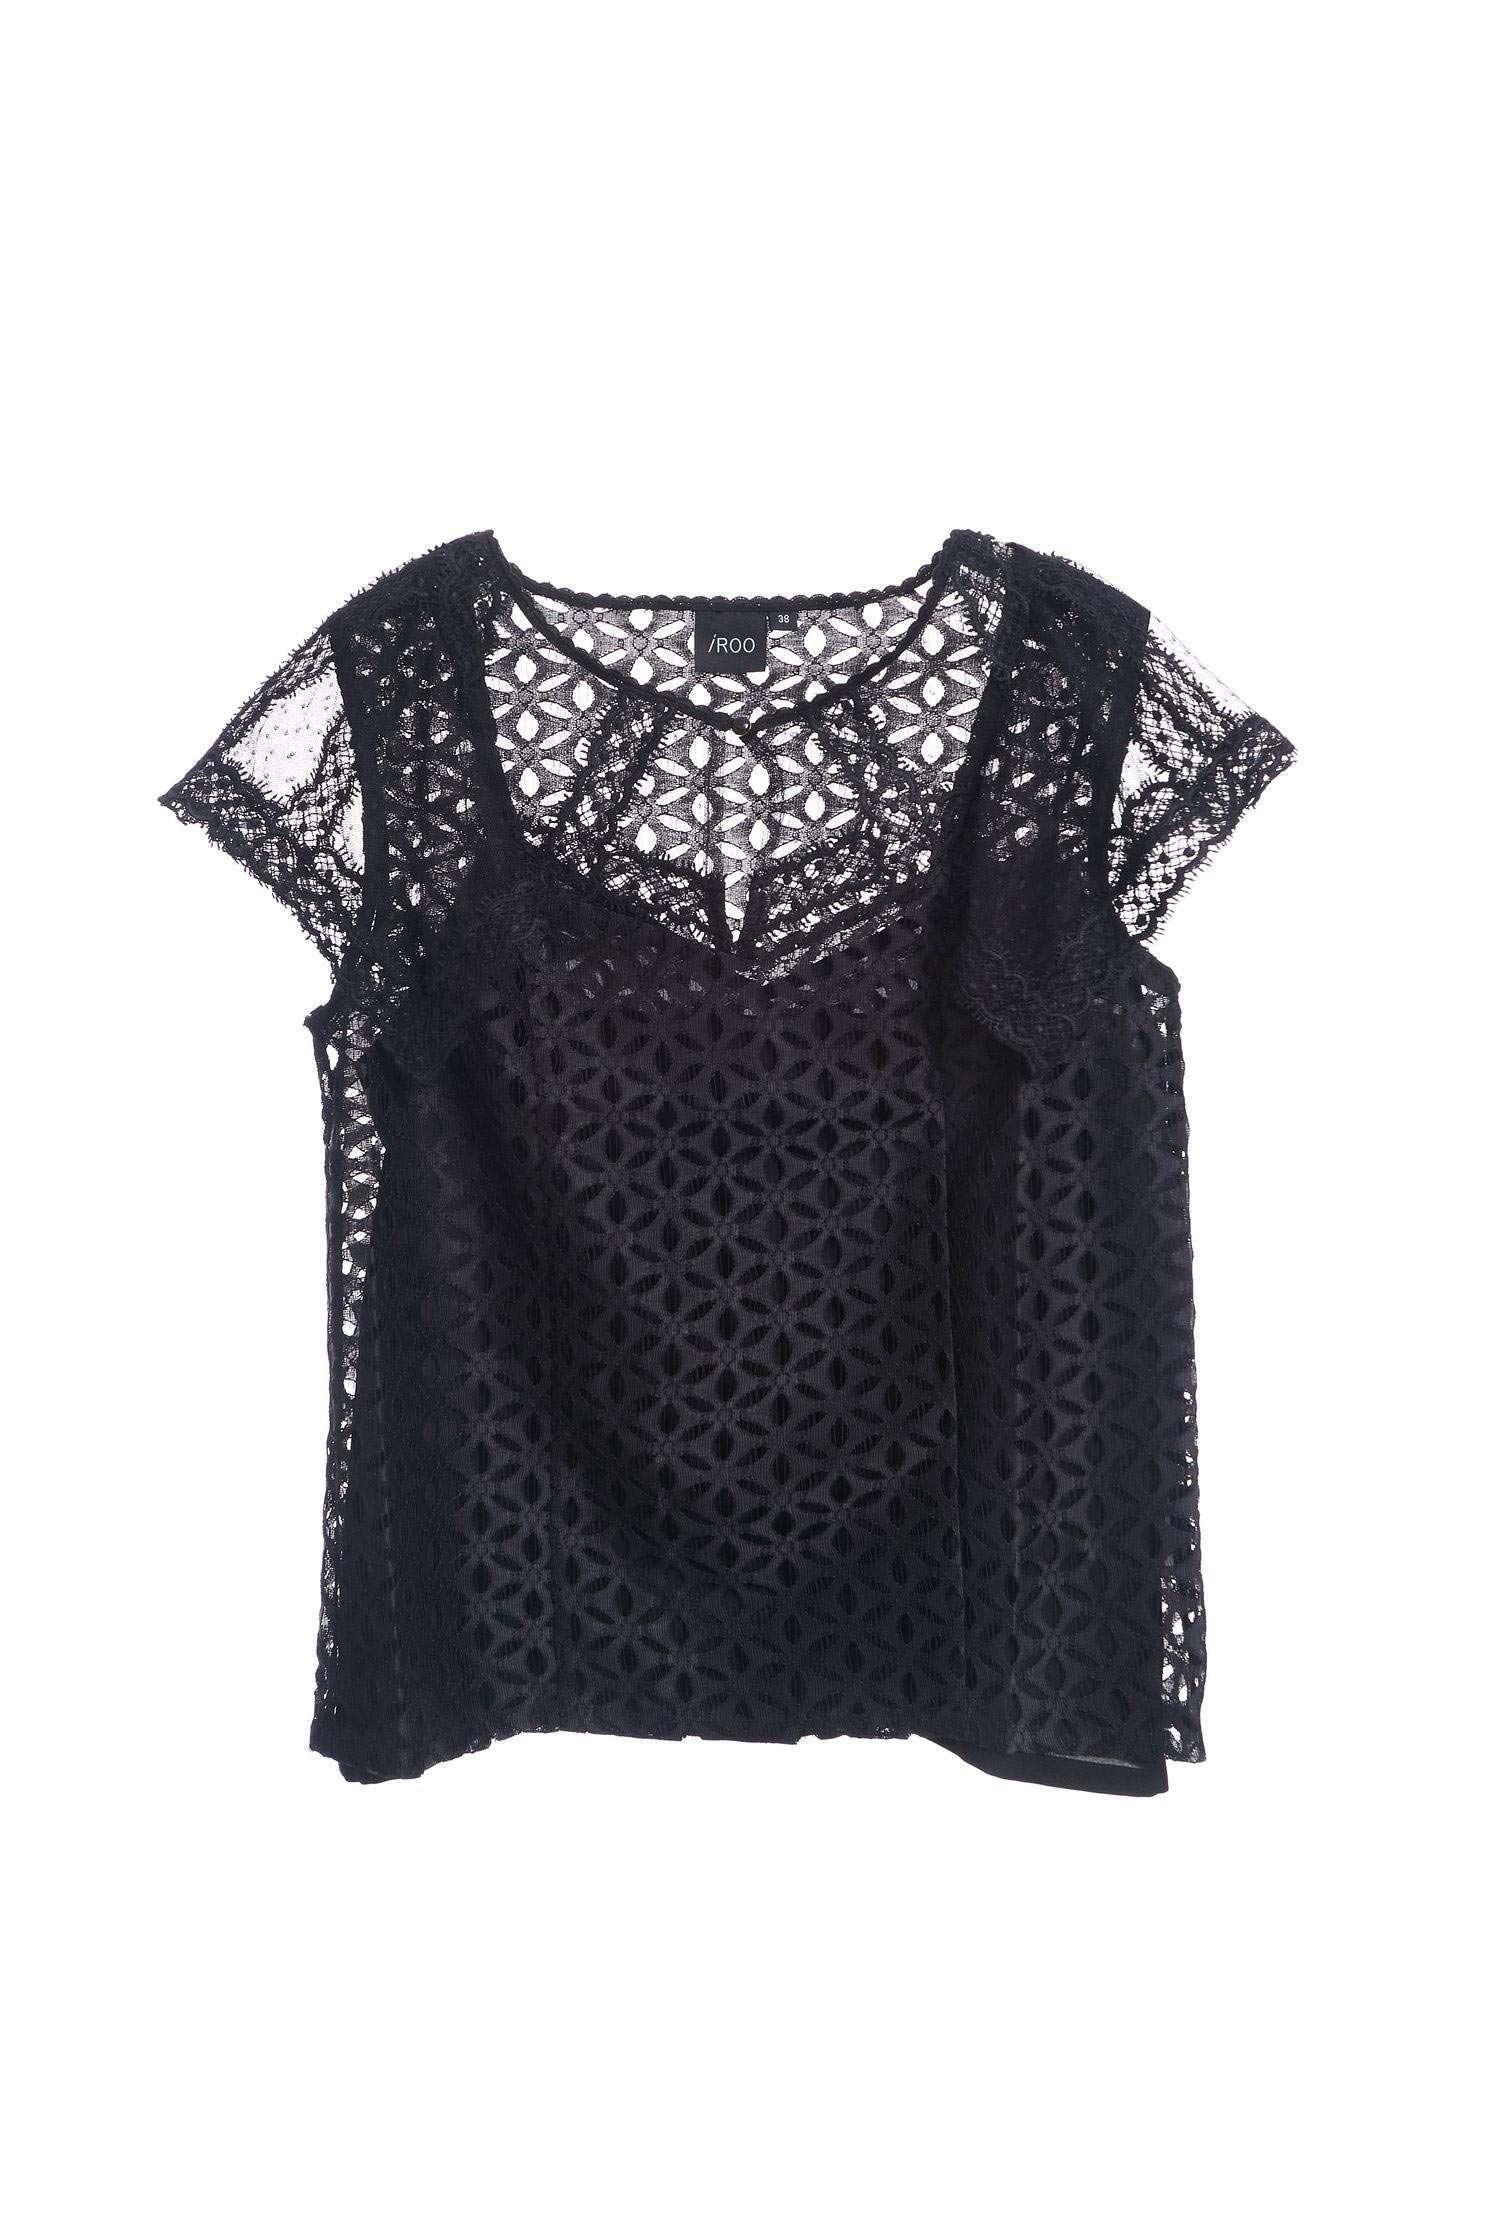 Elegant full lace classic design short-sleeved top